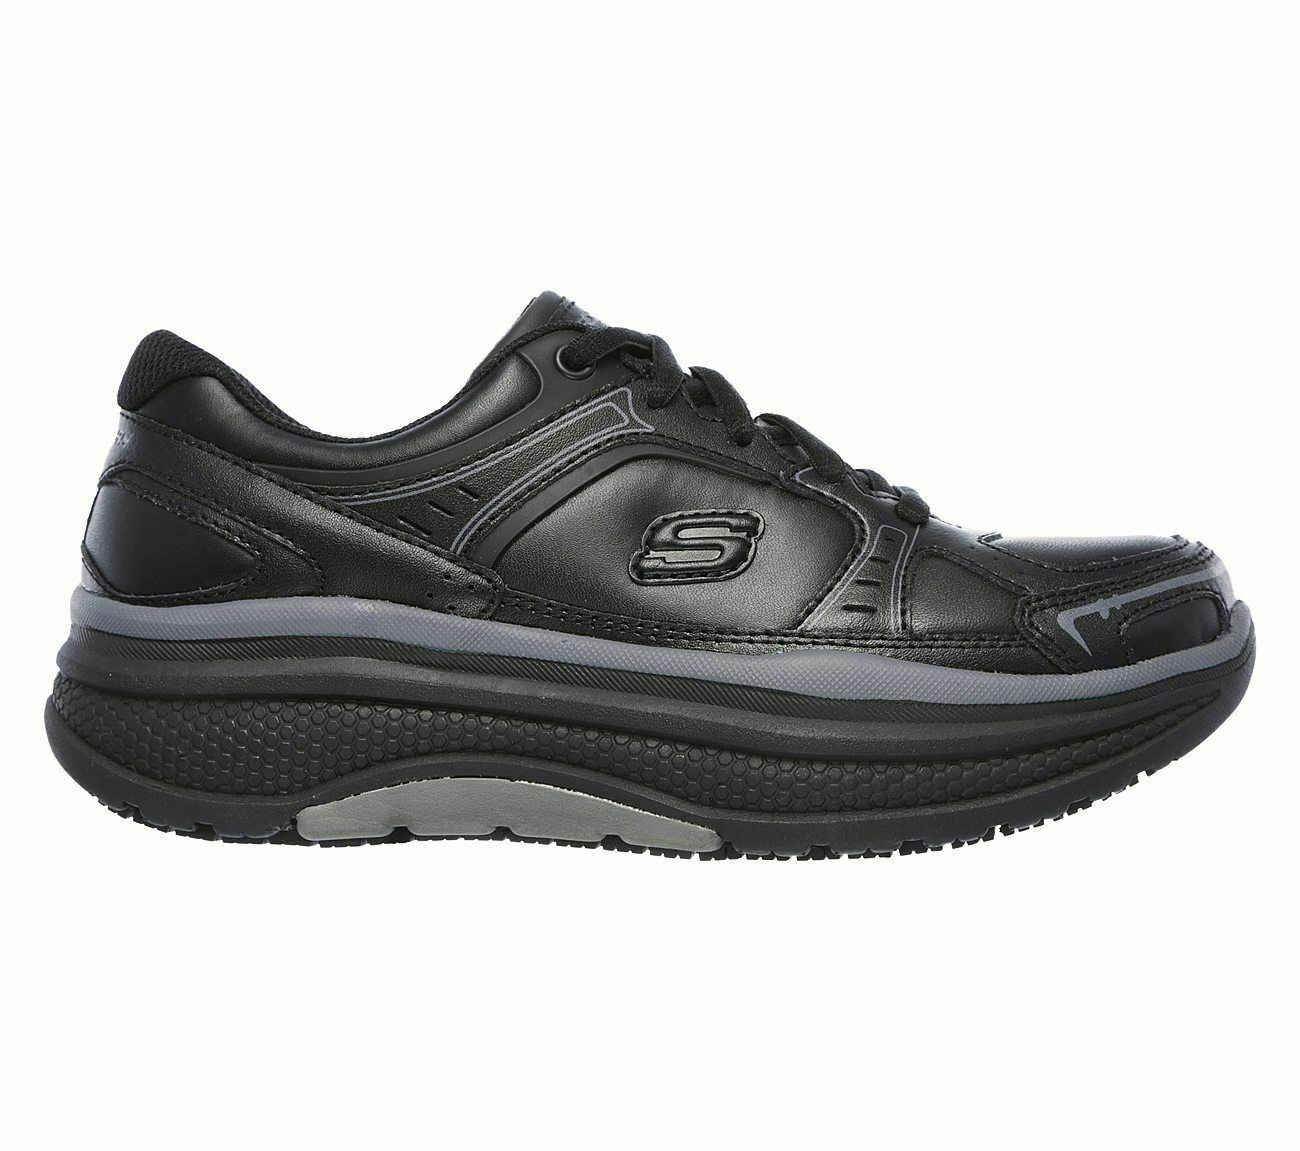 Womens Skechers Cheriton SR EH Electrical   Slip Resistant Work shoes 77218 BLK